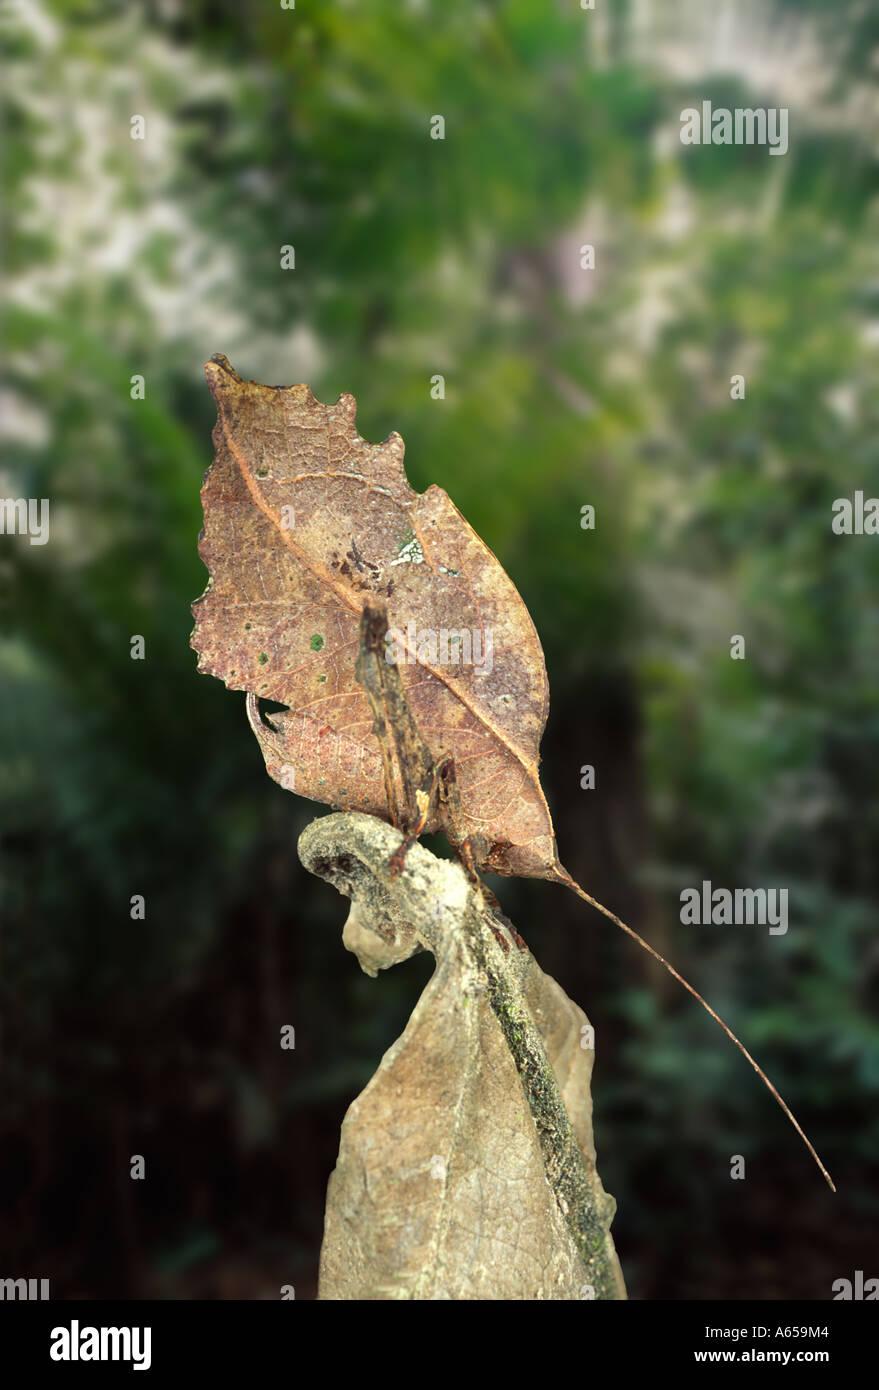 Leaf-mimic katydid, 'leaf insect', Typophyllum sp., Amazon rainforest, Loreto, Peru. Evolution - Stock Image